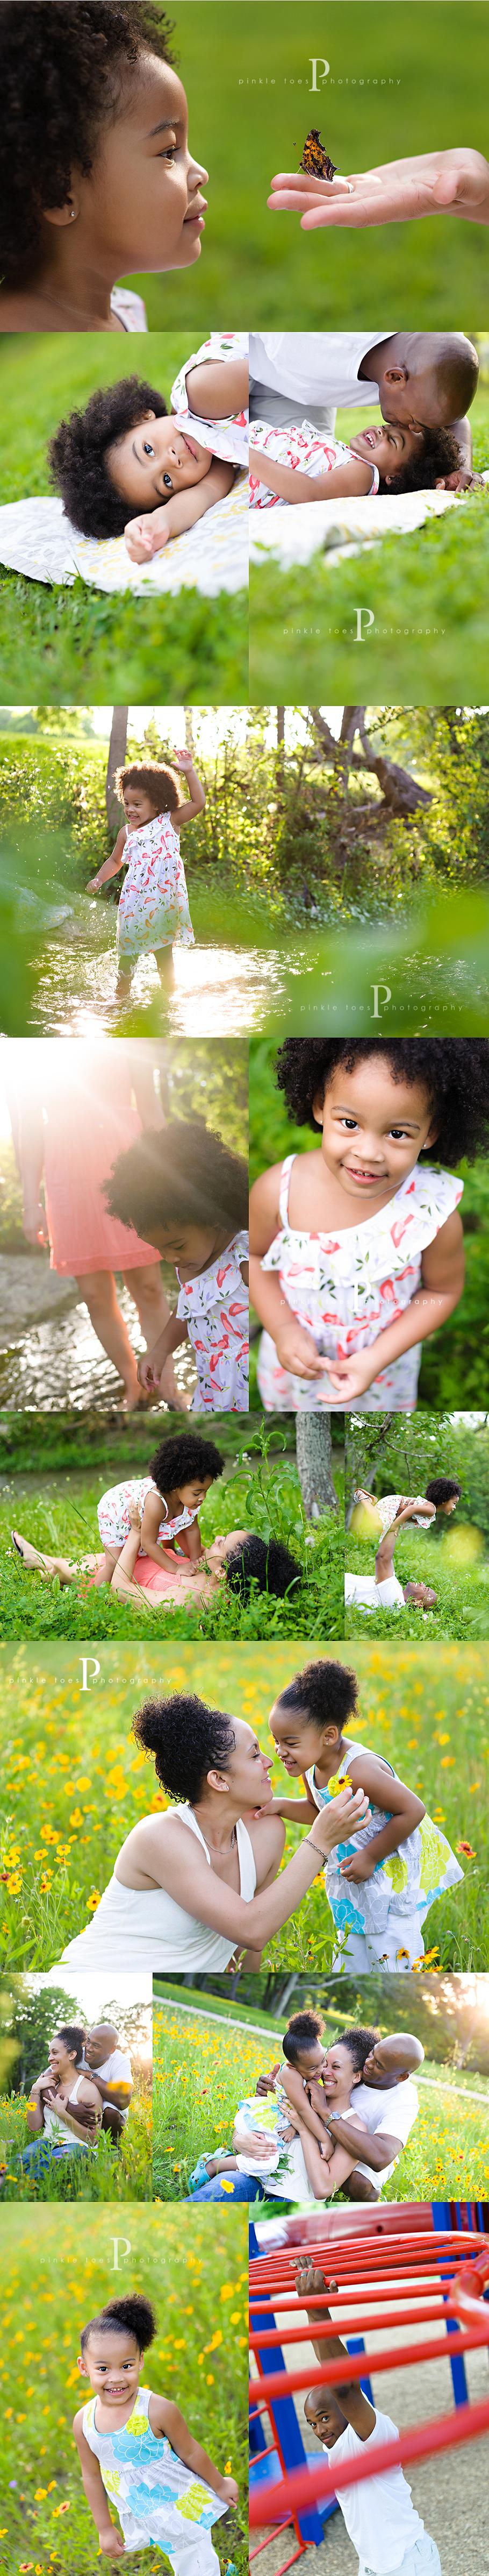 jf-austin-nature-modern-family-lifestyle-photographer-kid-photographer.jpg